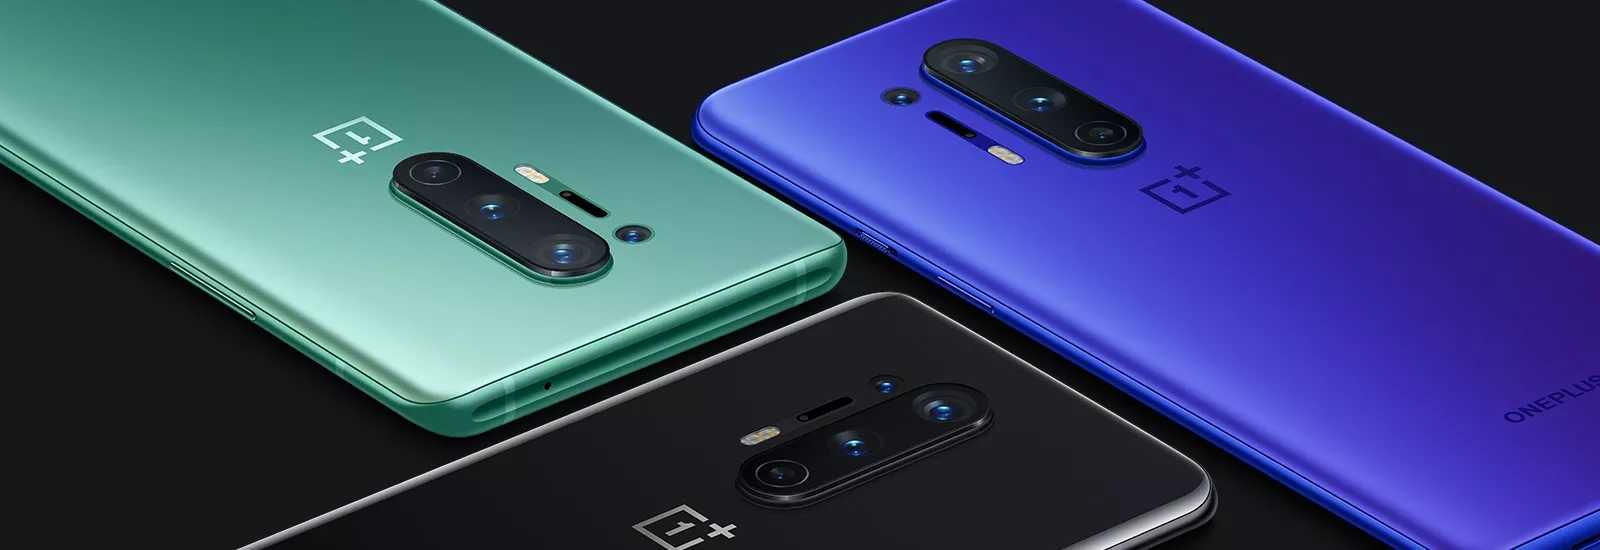 OnePlus 8 Pro Ultramarine Blue 12GB+256GB